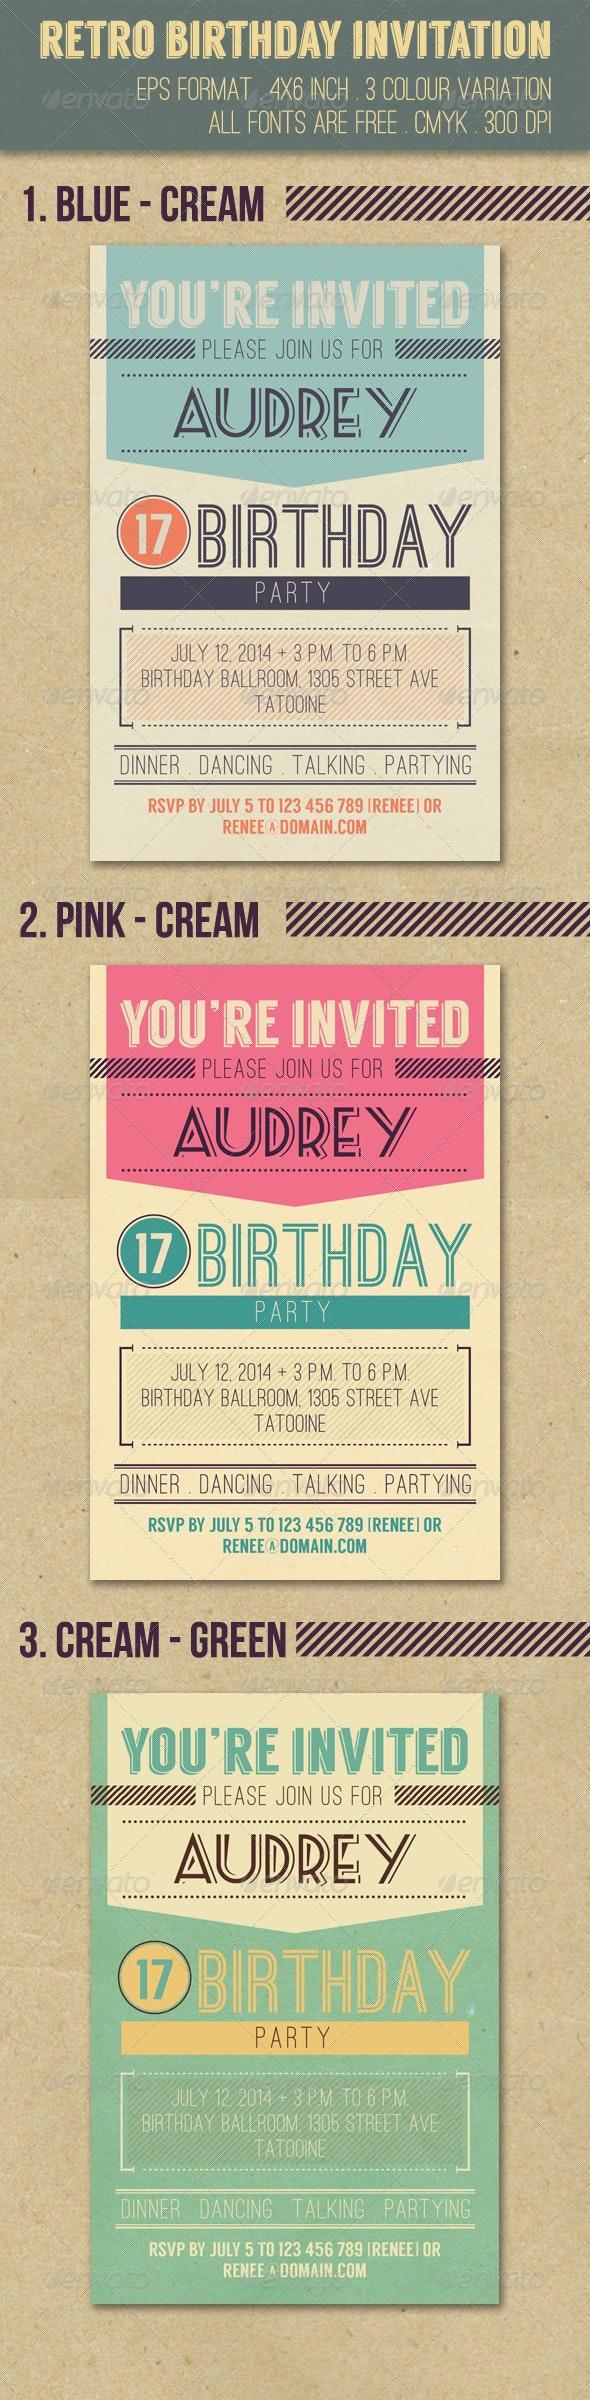 Retro Birthday Invitation - Invitations Cards & Invites